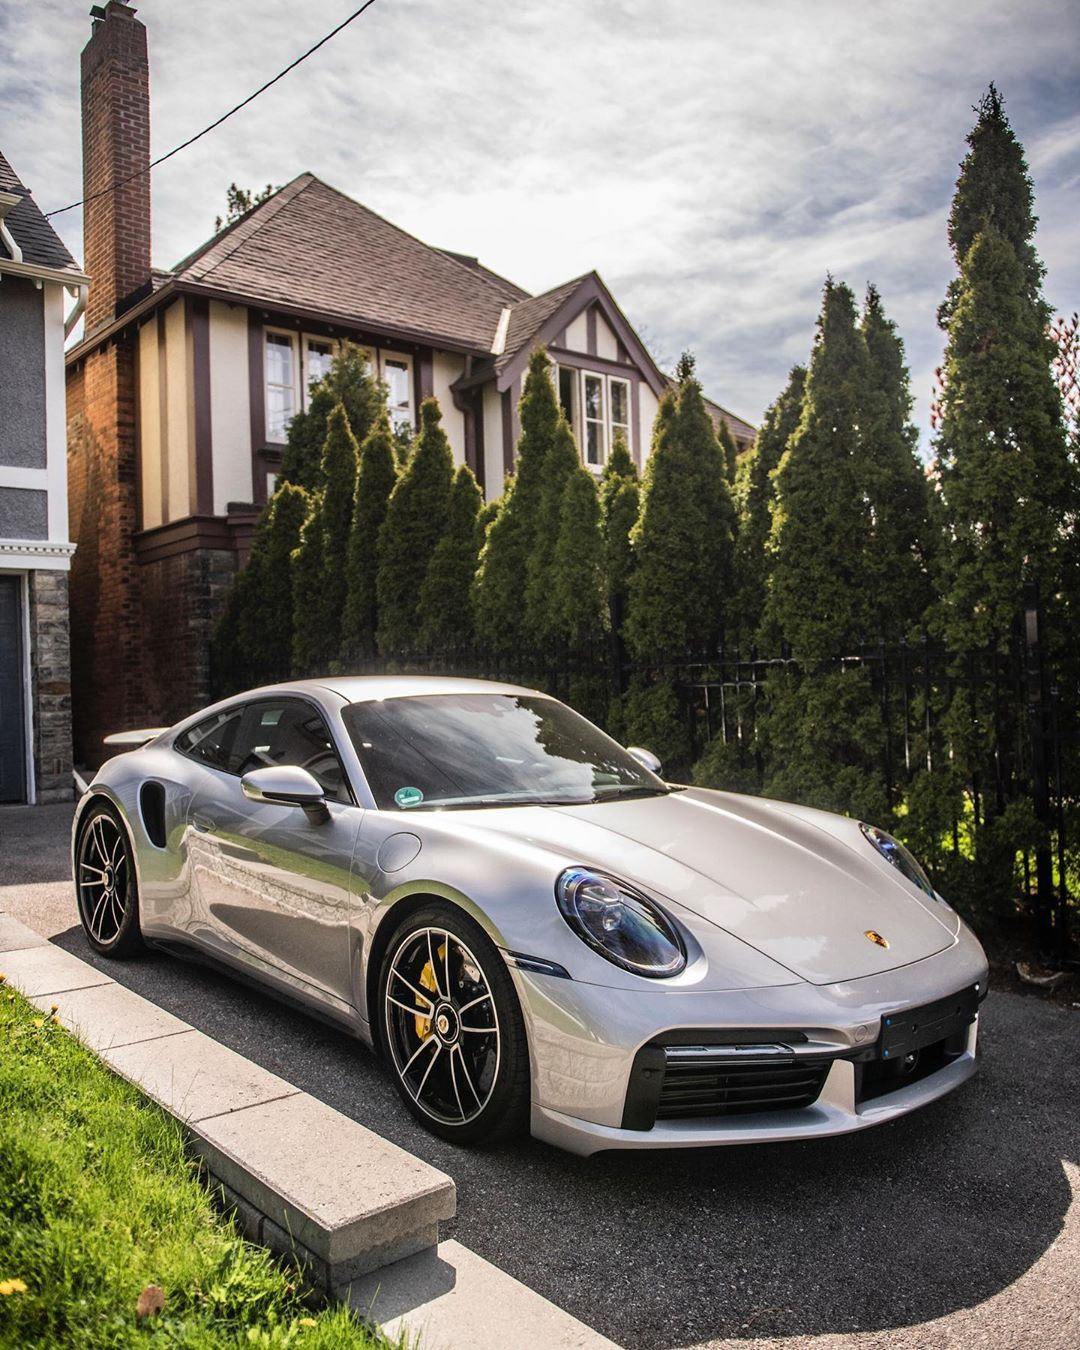 Porsche 911 Turbo S Best Luxury Cars Sports Cars Luxury Amazing Cars